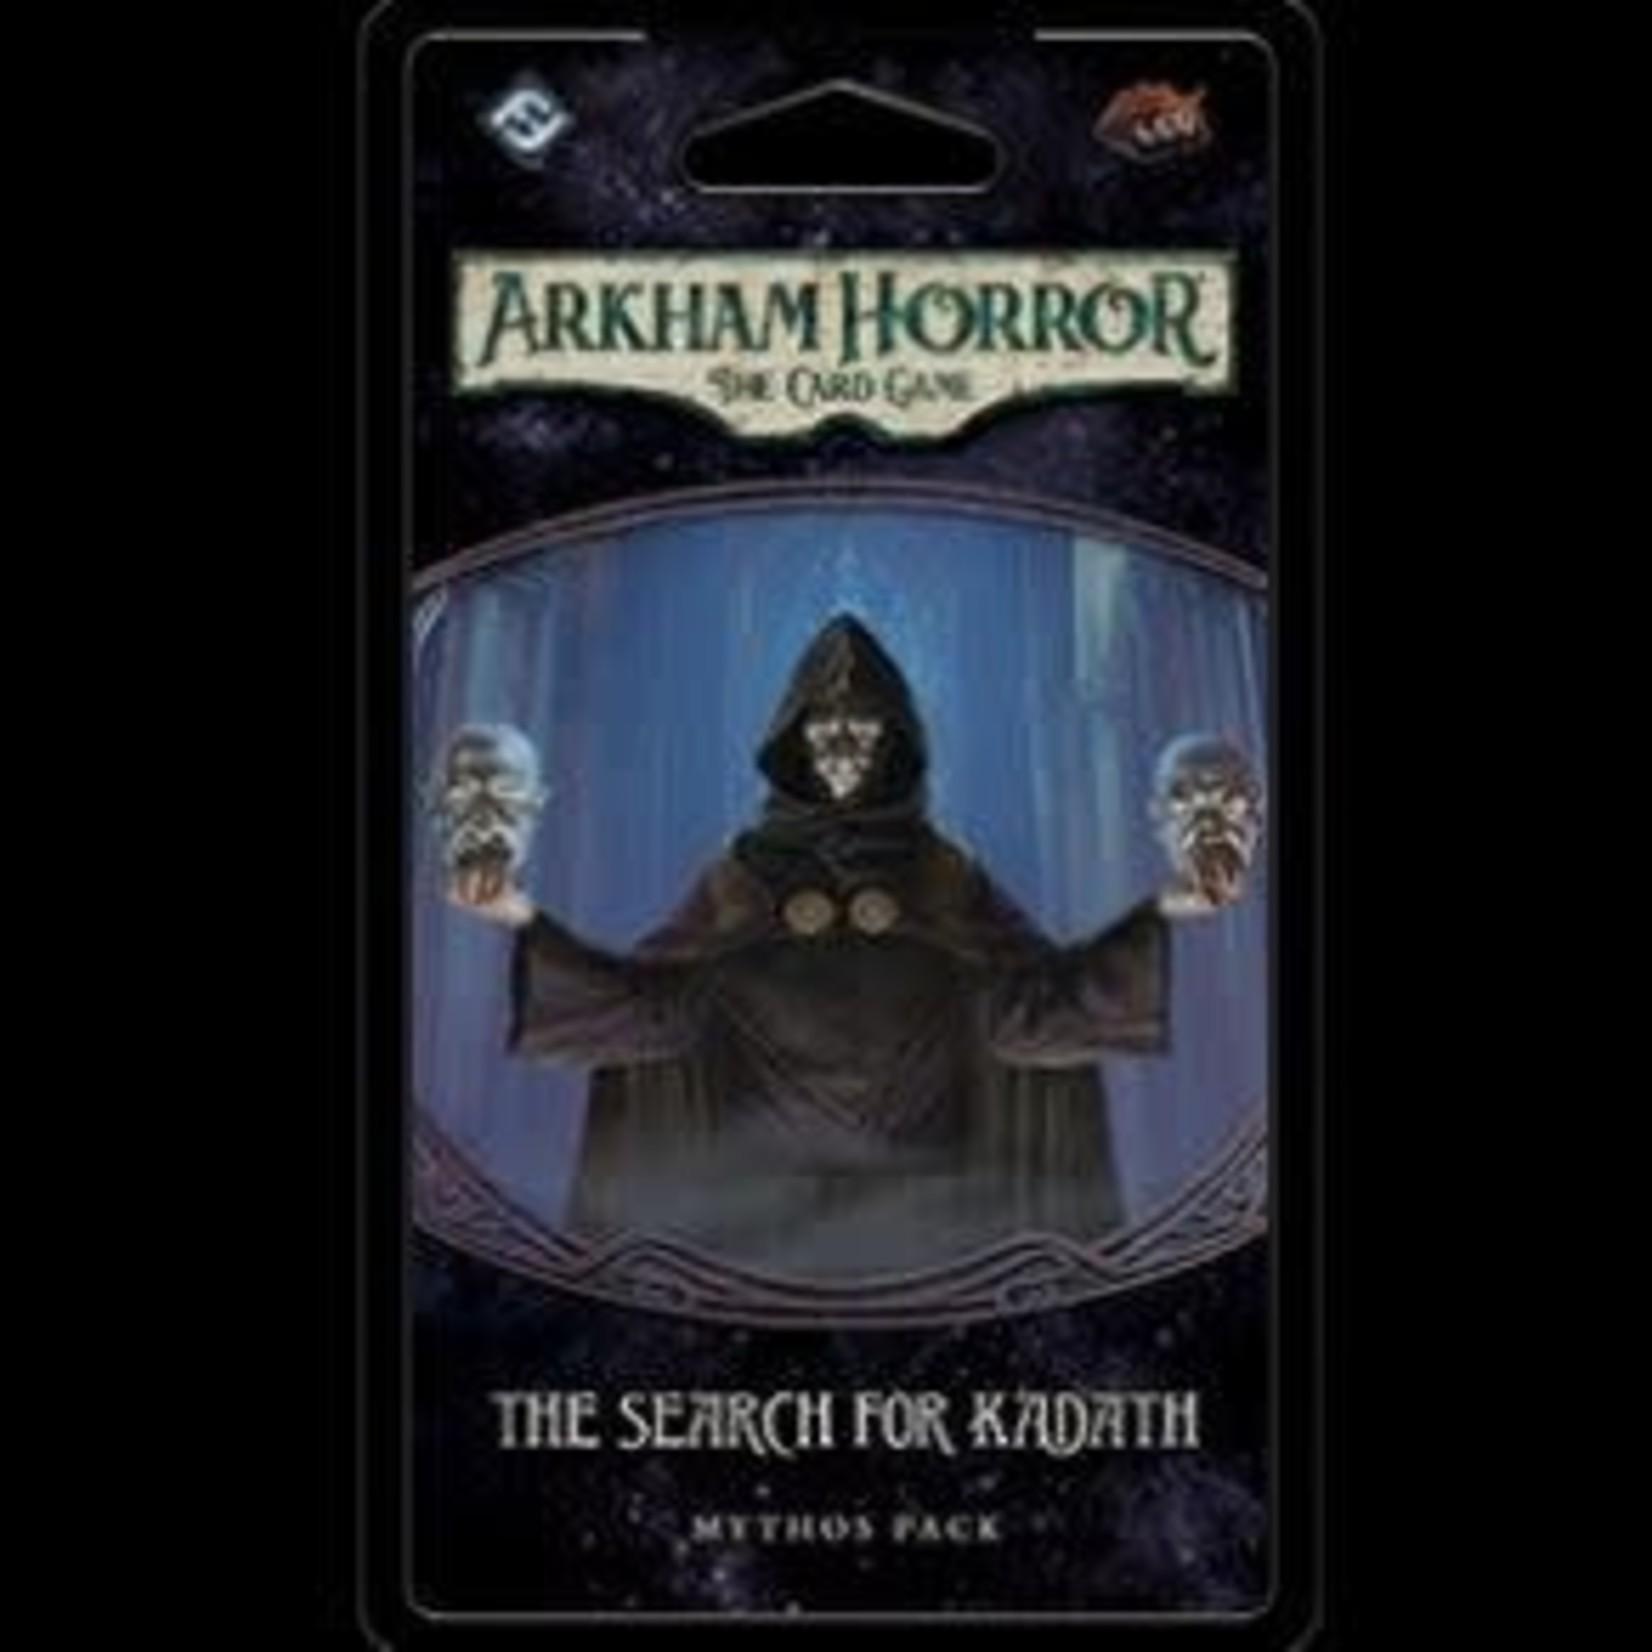 Fantasy Flight Games Arkham Horror LCG: The Search for Kadath Mythos Pack (Dream Eaters Pack 1)